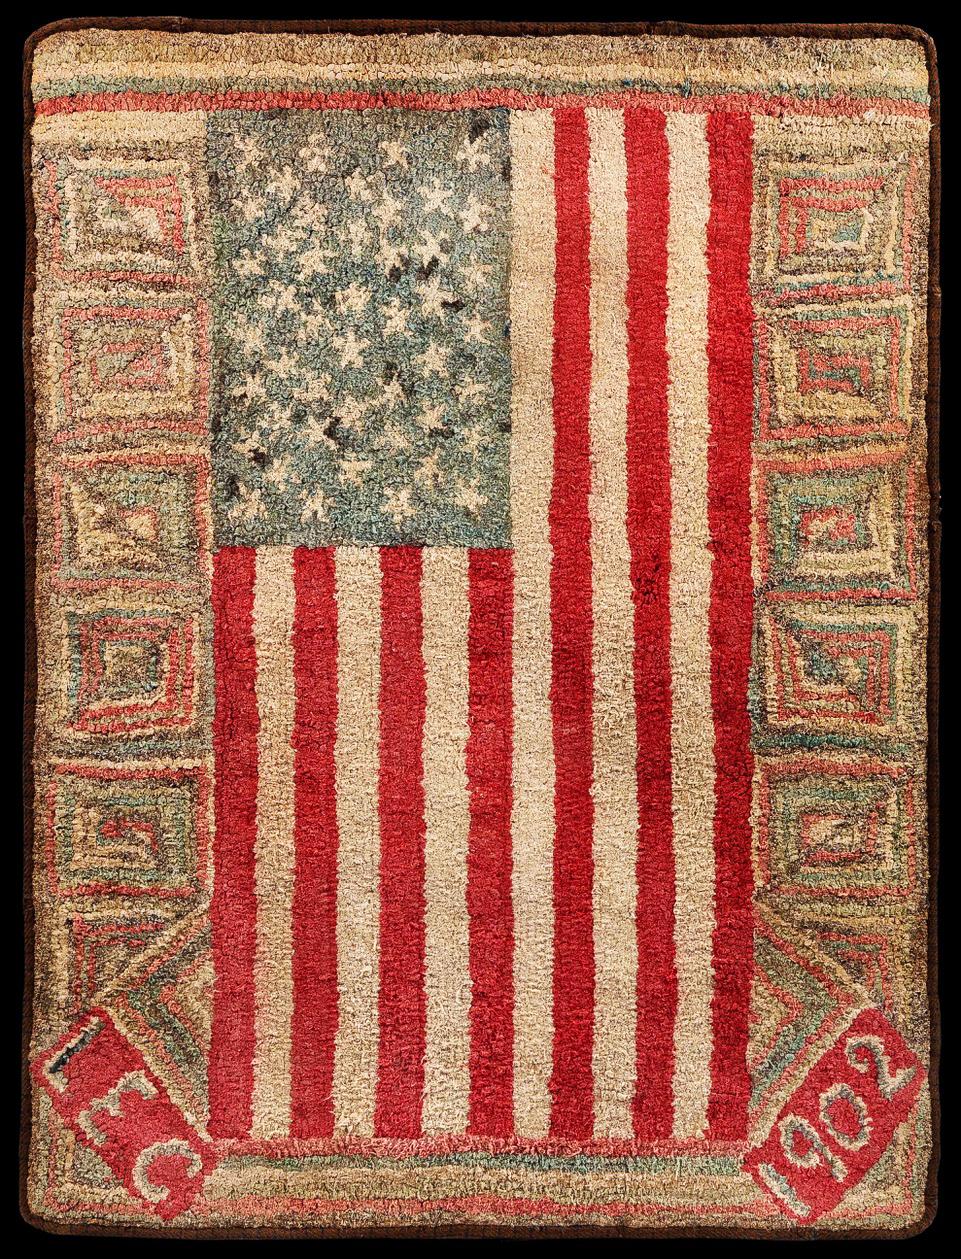 1902-Flag_Hooked_Rug